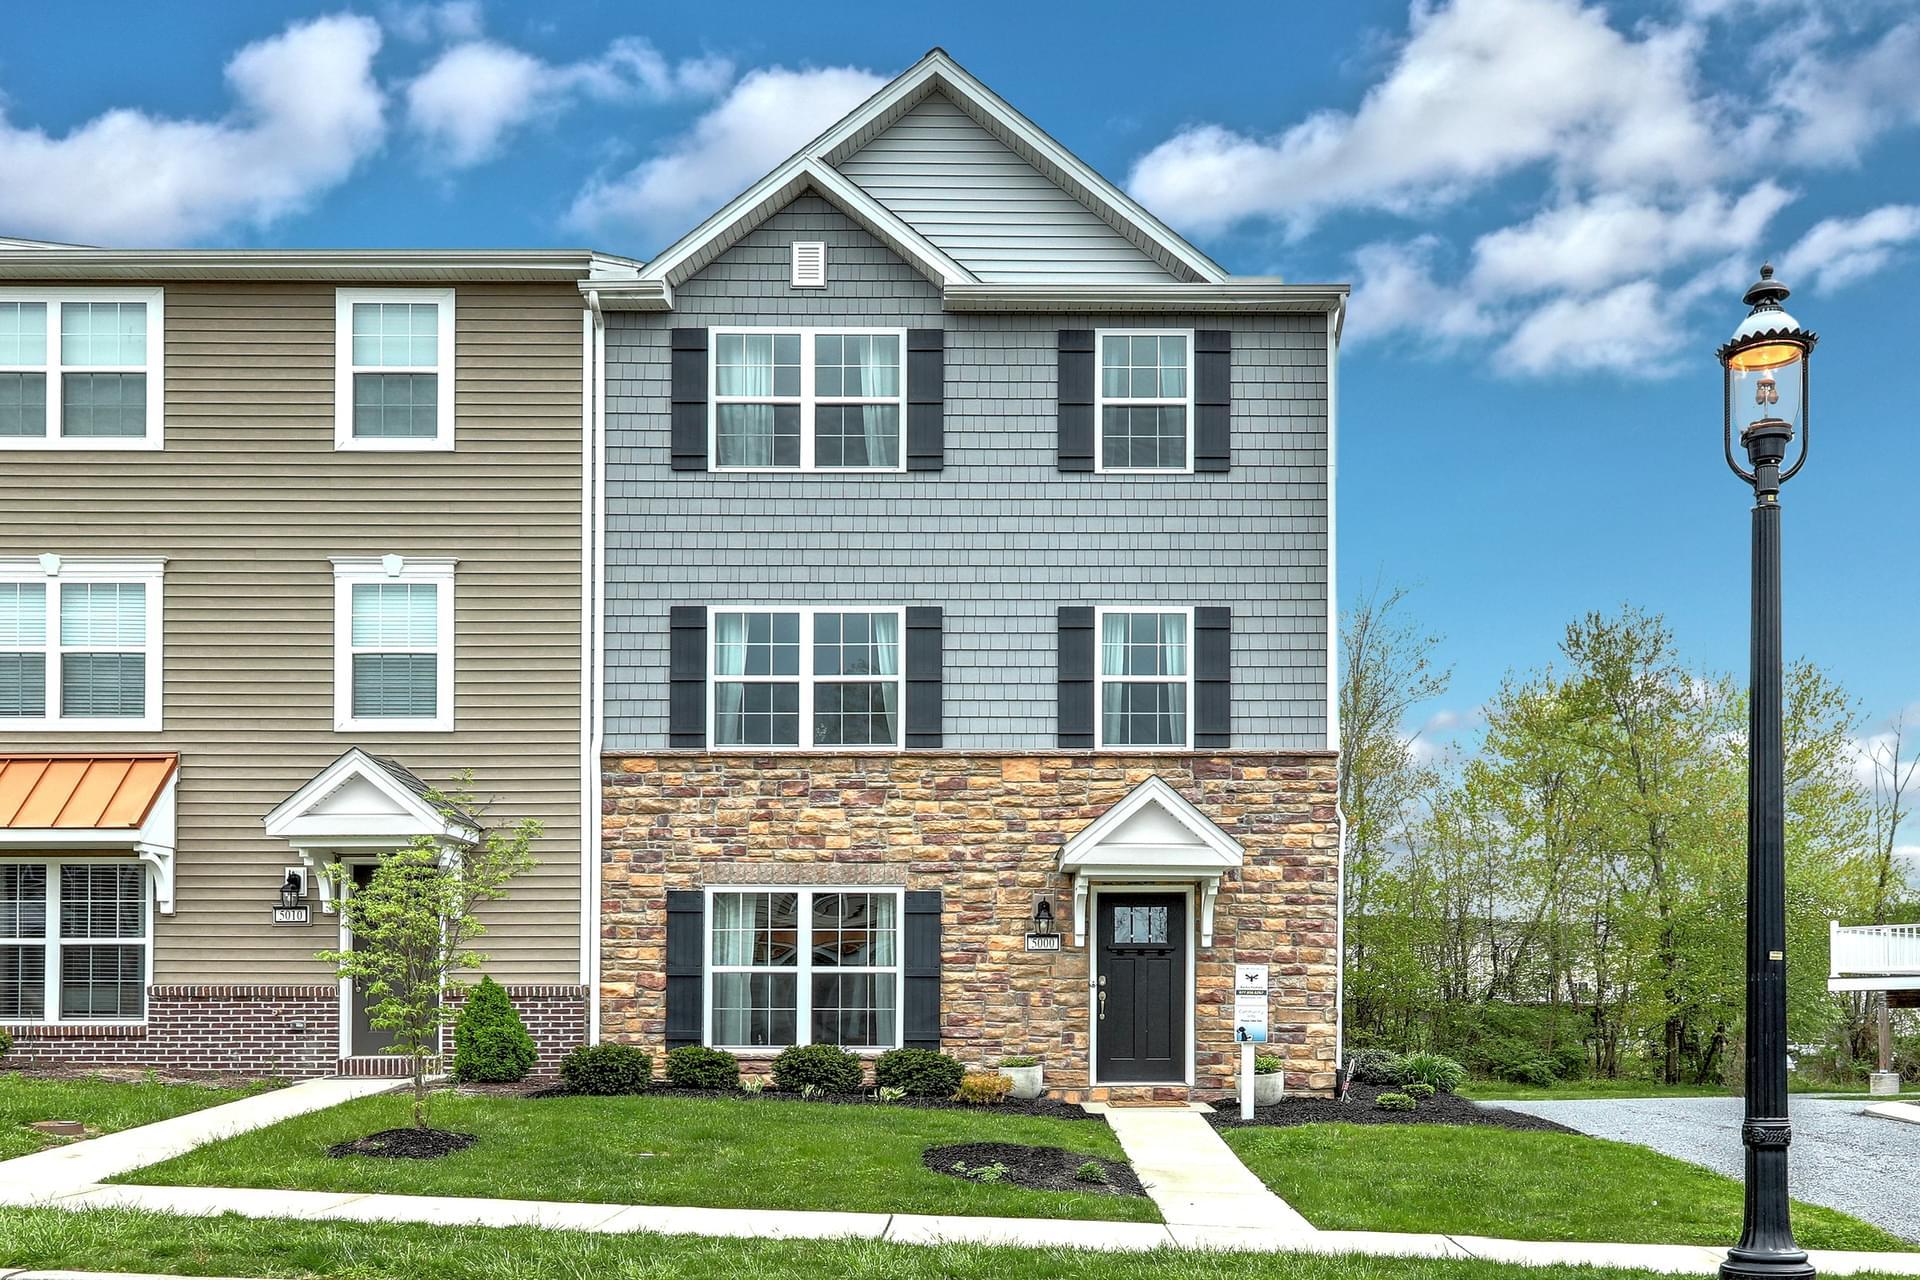 Laurel Ridge New Homes in Enola, PA